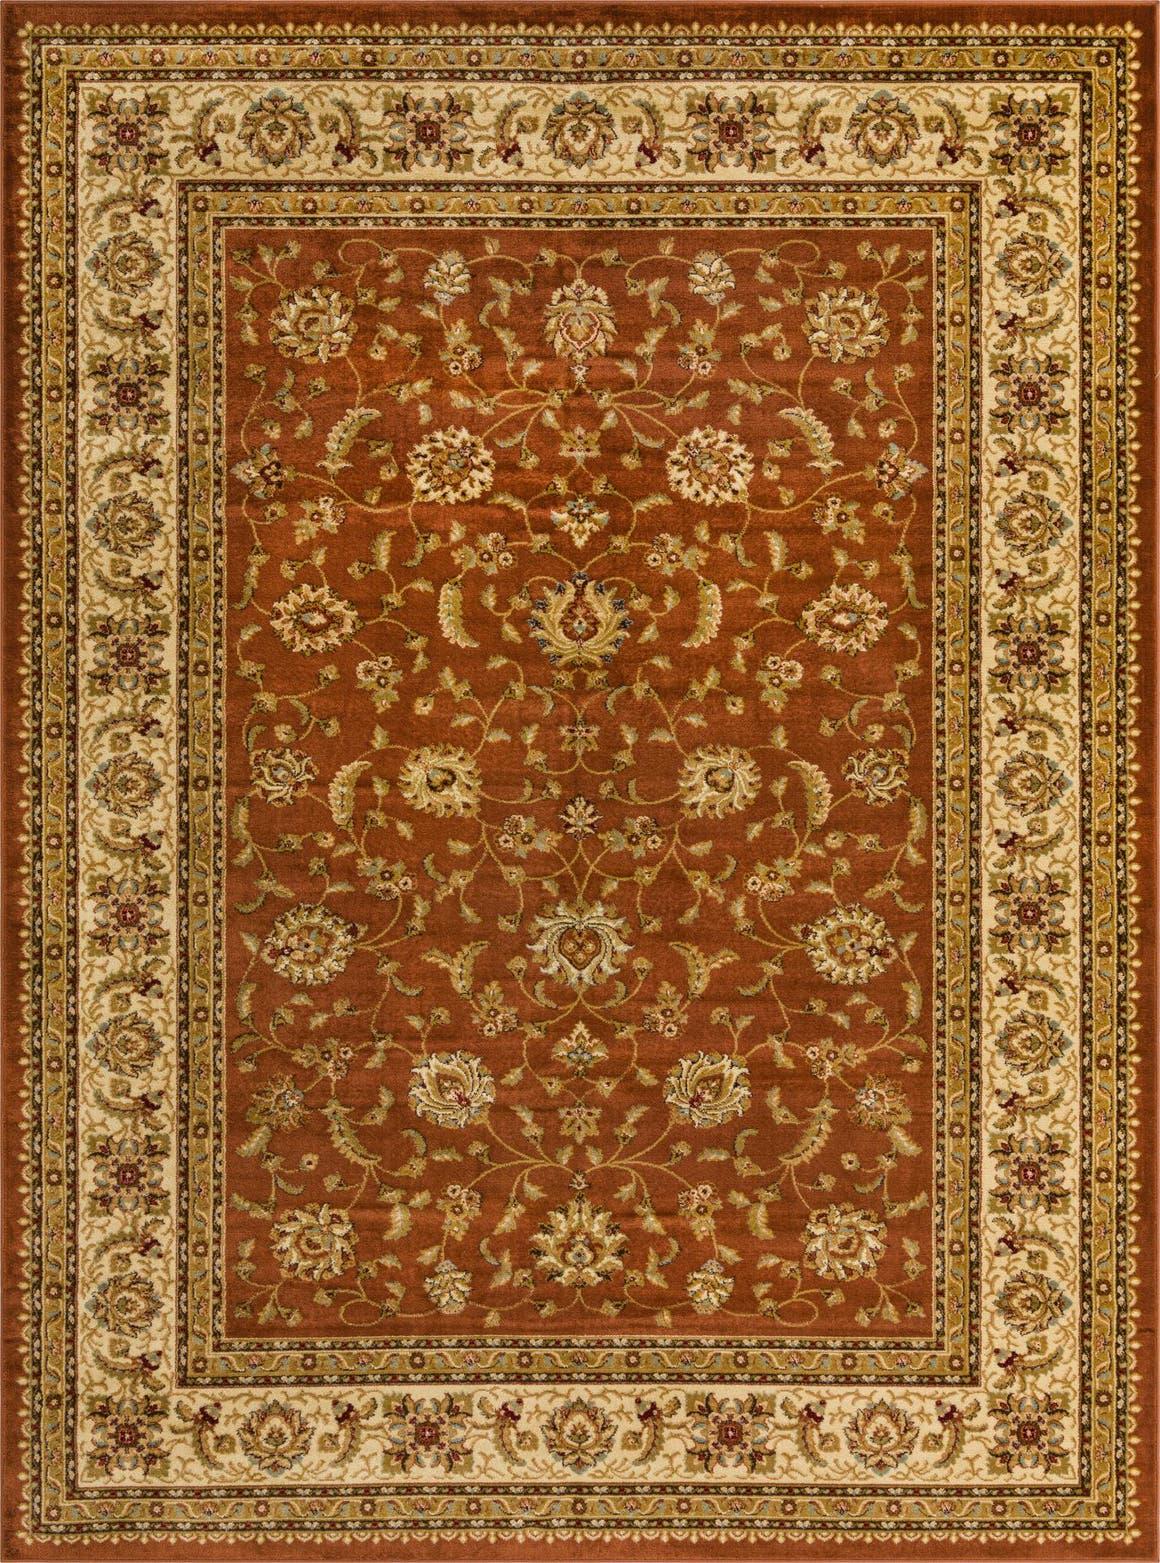 9' x 12' Classic Agra Rug main image